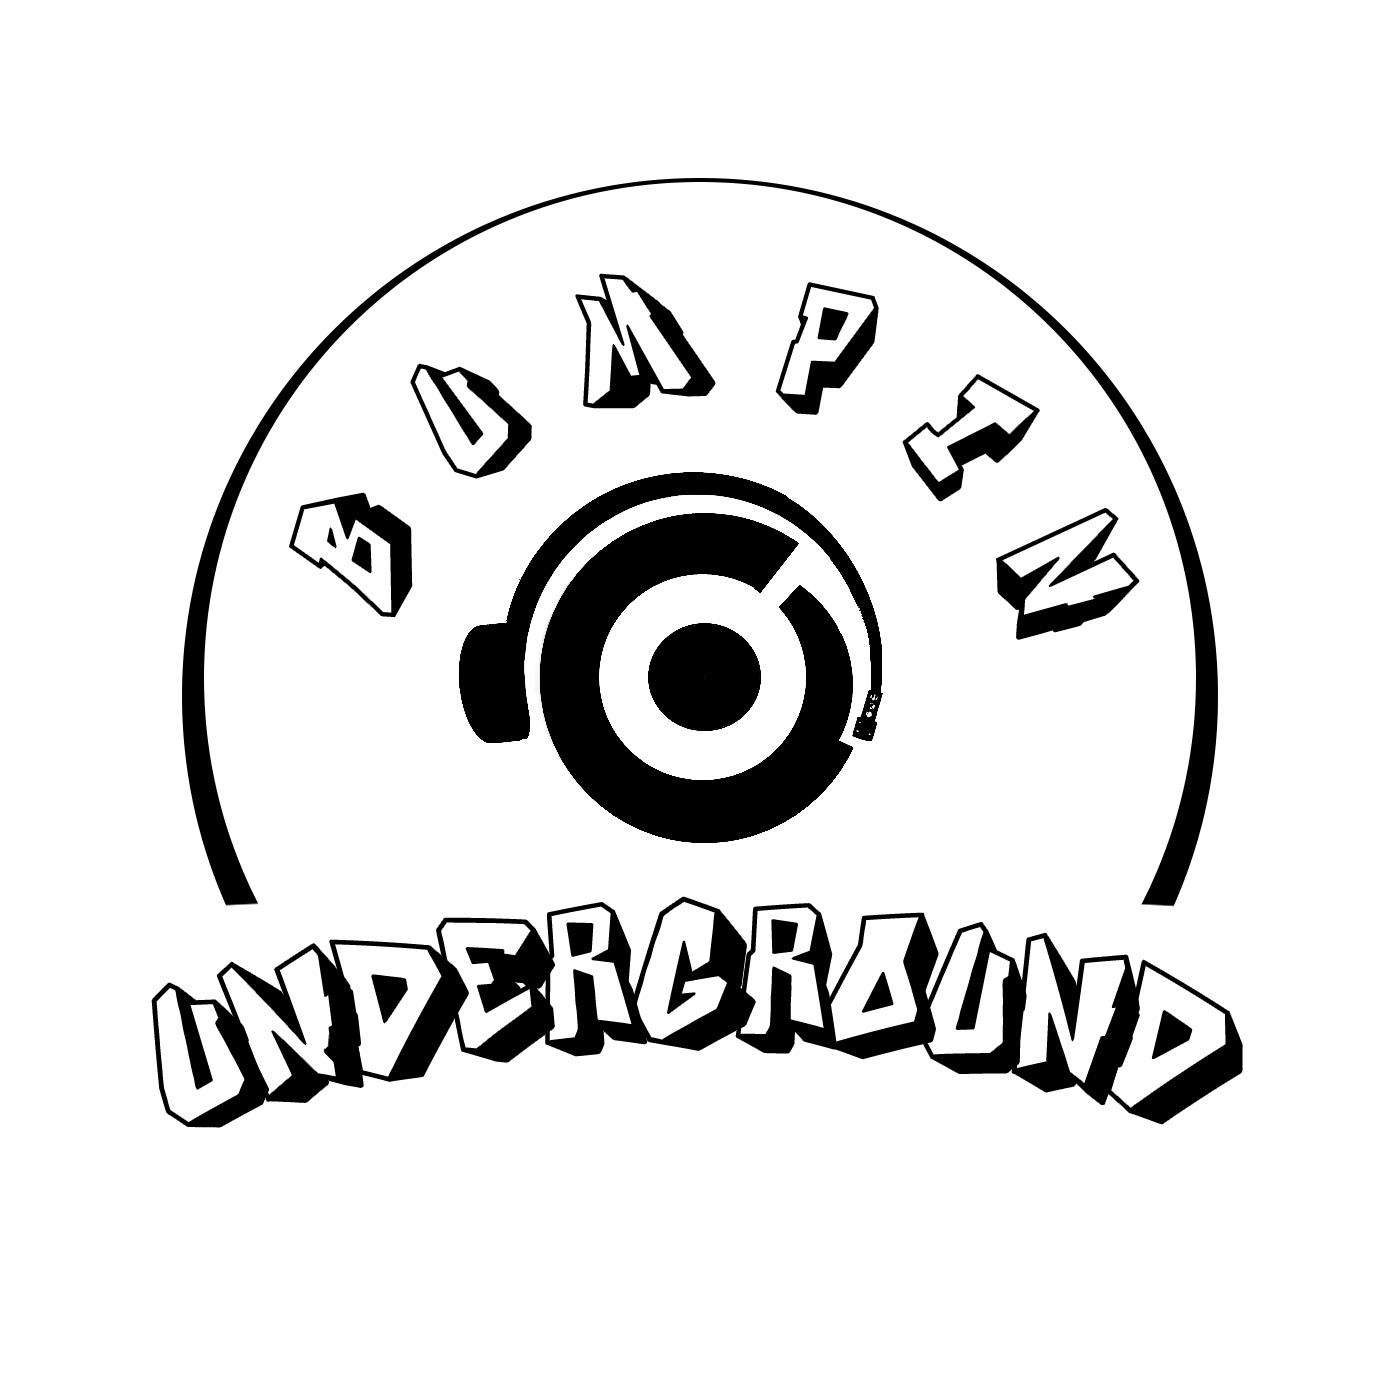 Bumpin Underground